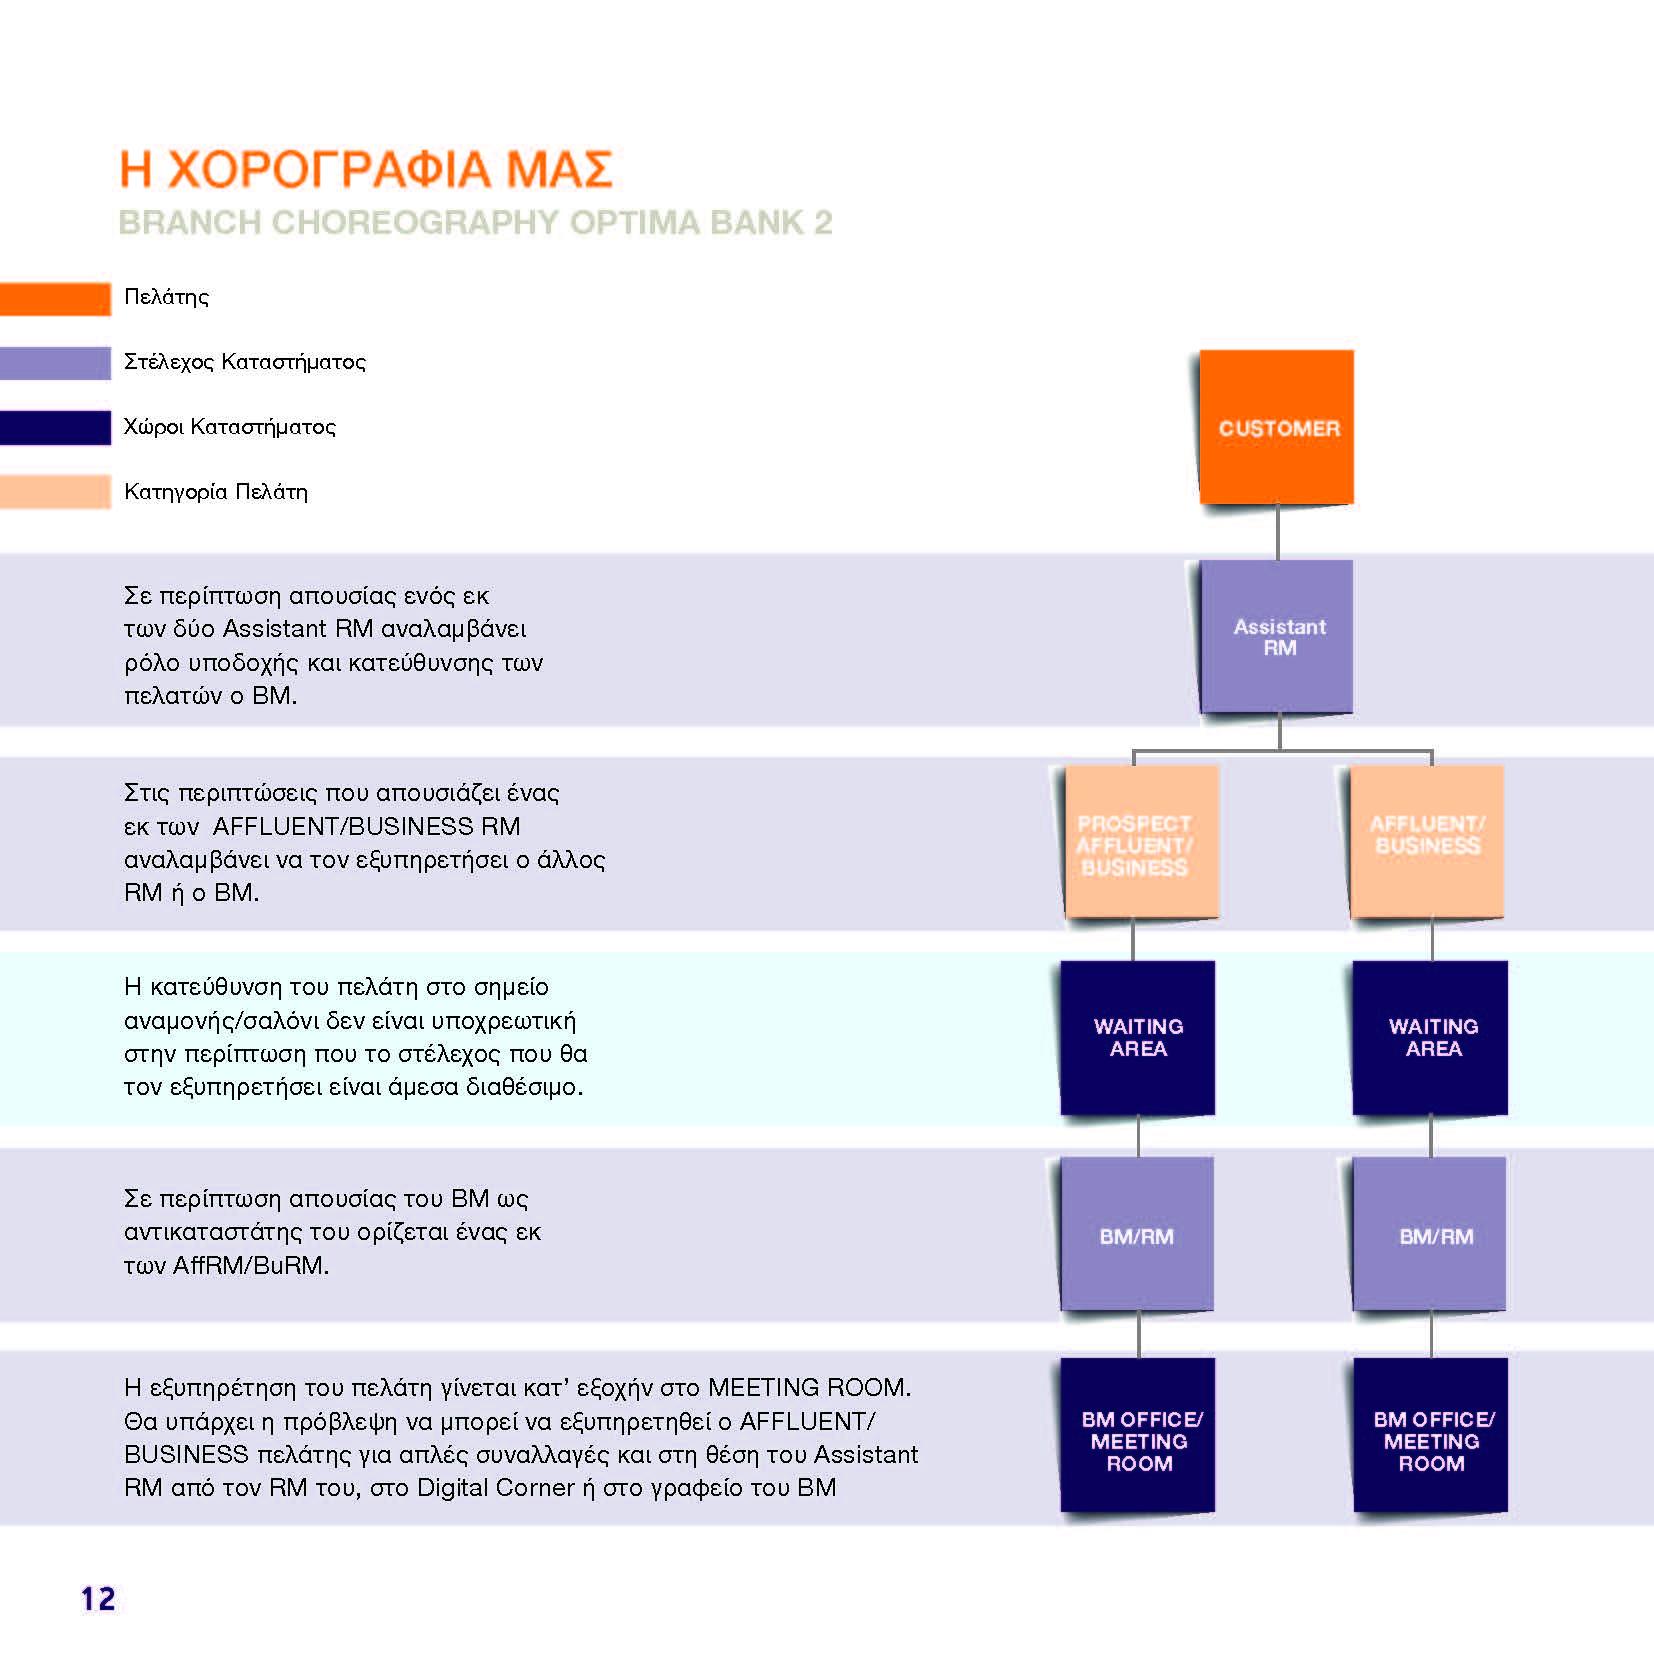 https://www.jib.gr/wp-content/uploads/2020/09/OPTIMA-BANK-BOOKLET-WEB_Page_012.jpg